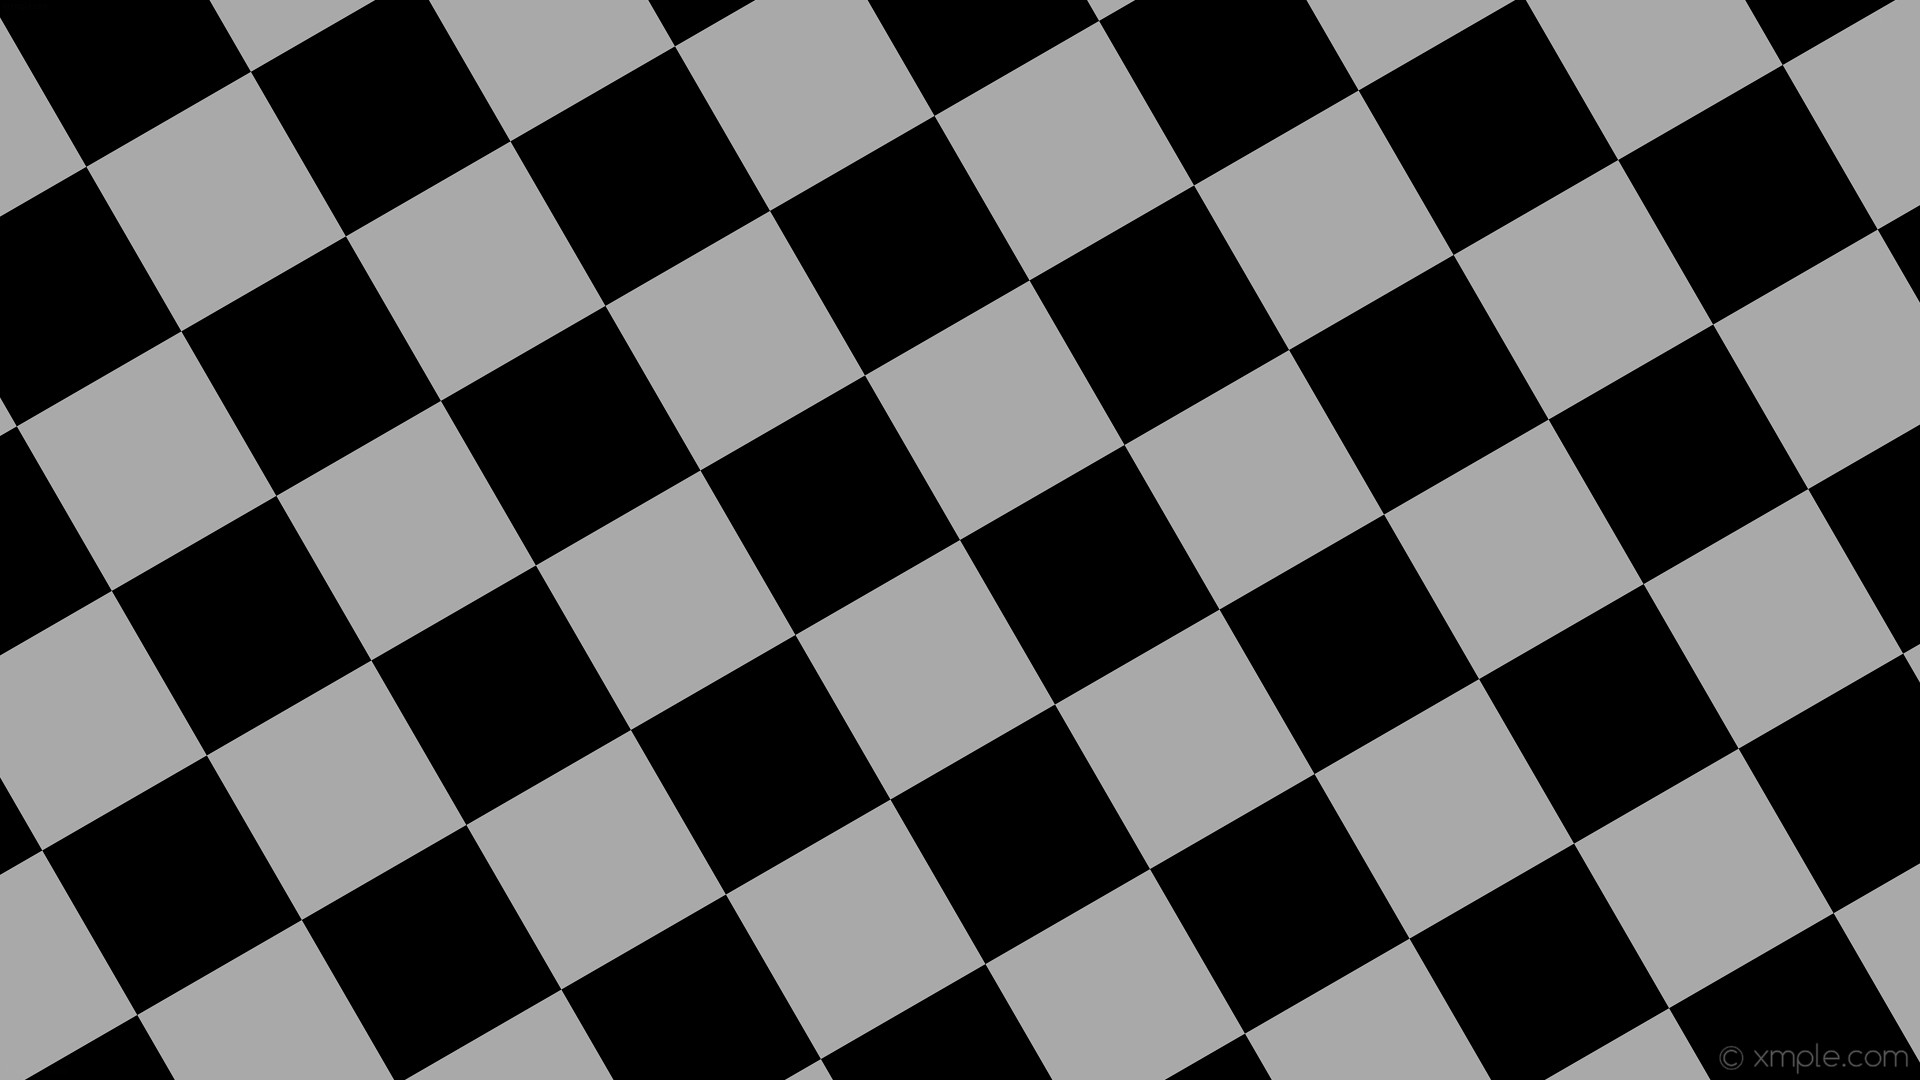 Res: 1920x1080, wallpaper black grey checkered squares dark gray #000000 #a9a9a9 diagonal  30° 190px